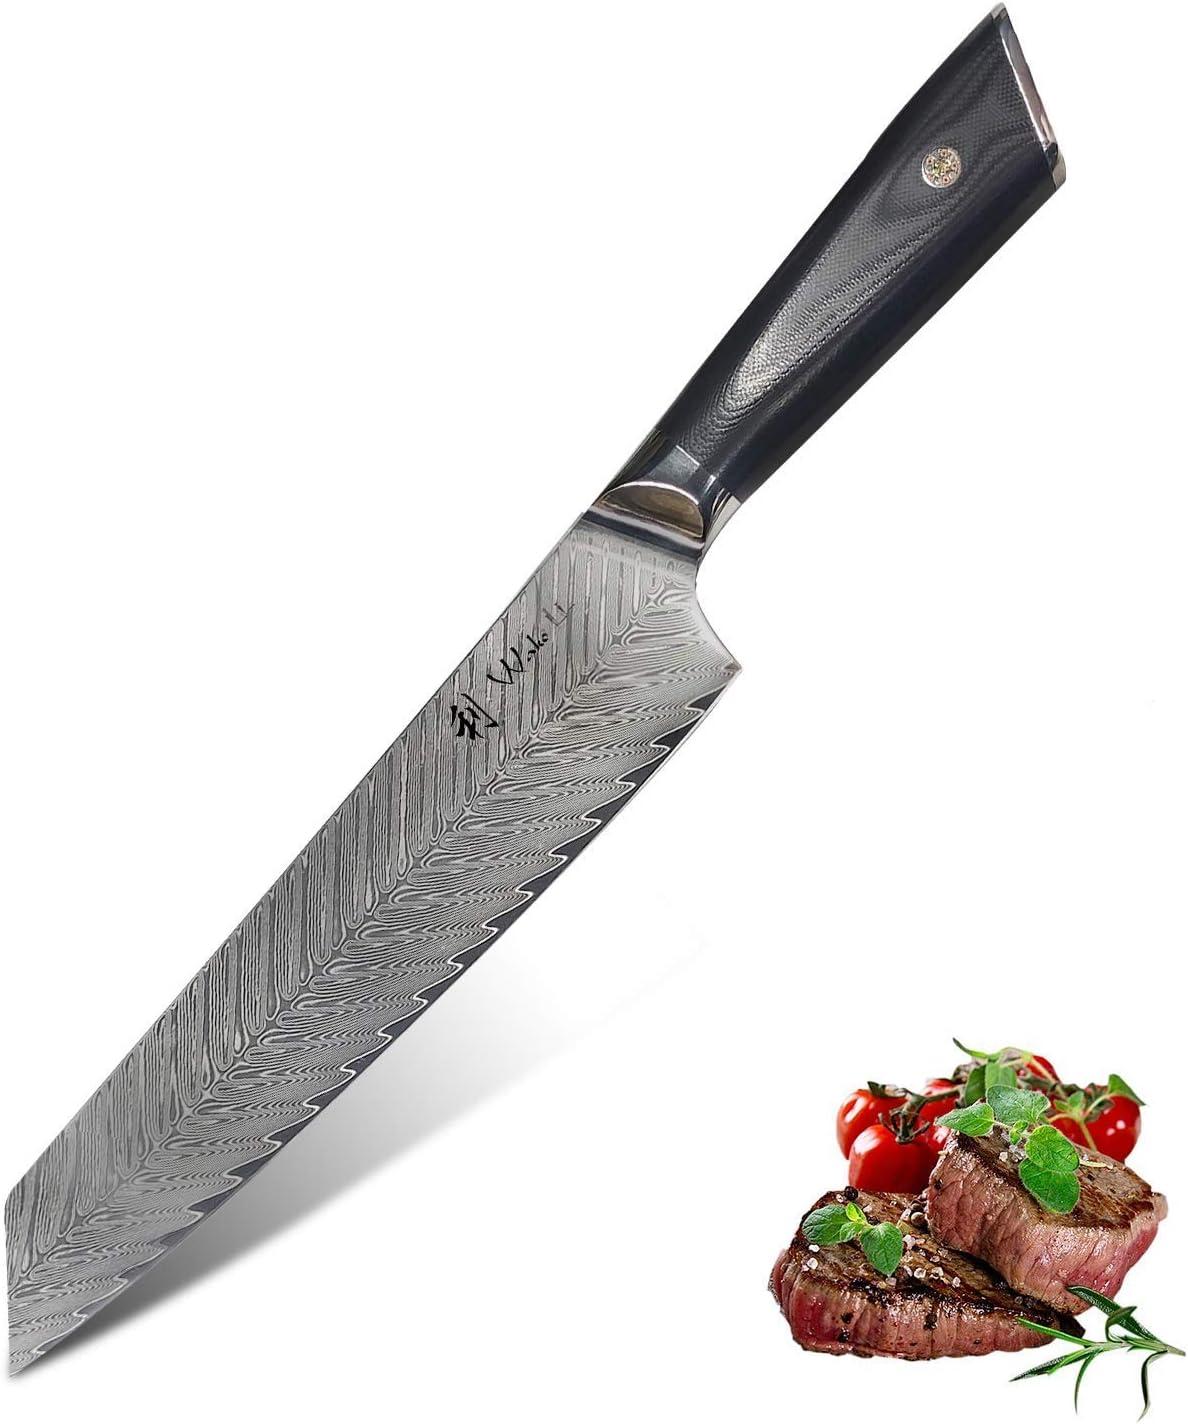 Lowest price challenge Large special price Wakoli Damascus Chef knife Medium sharp 8.7-inch bla - extremely